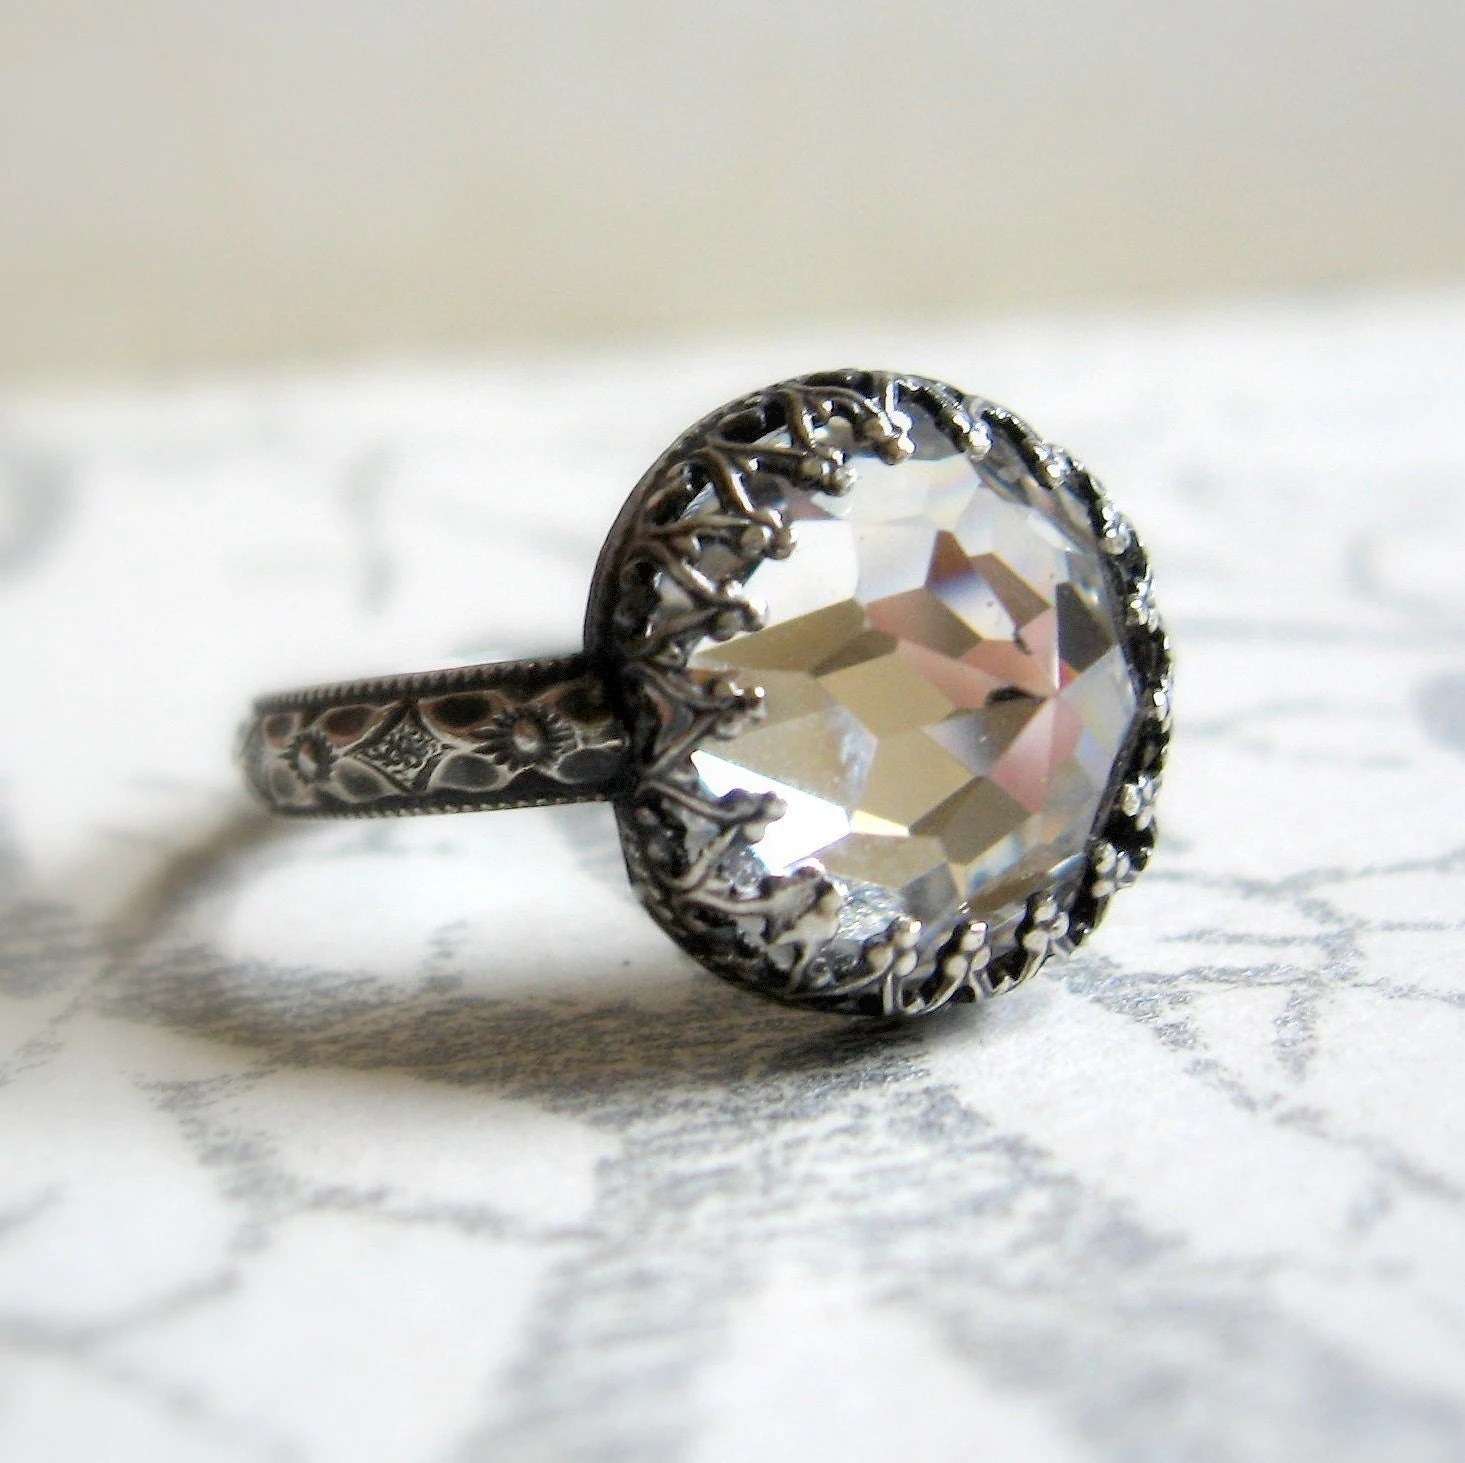 hello wedding non diamond wedding rings non traditional wedding rings Lemon Quartz Twig Ring by Sarah Hood Jewelry